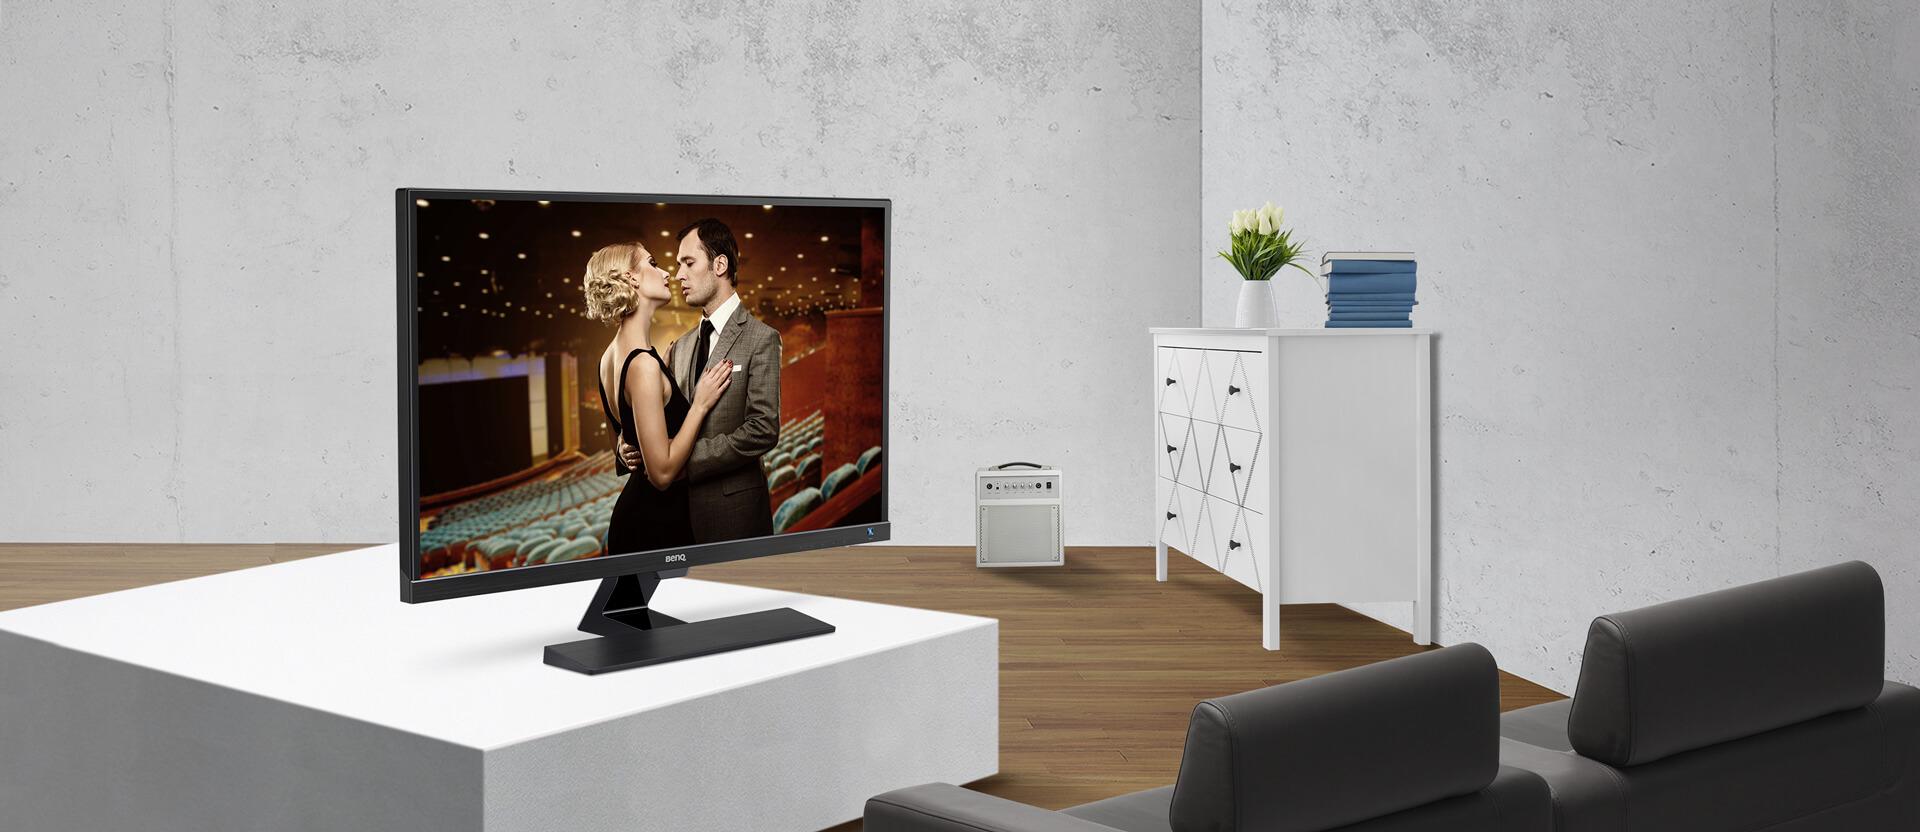 BenQ EW3270ZL 1440p 32 Inch Entertainment Monitor